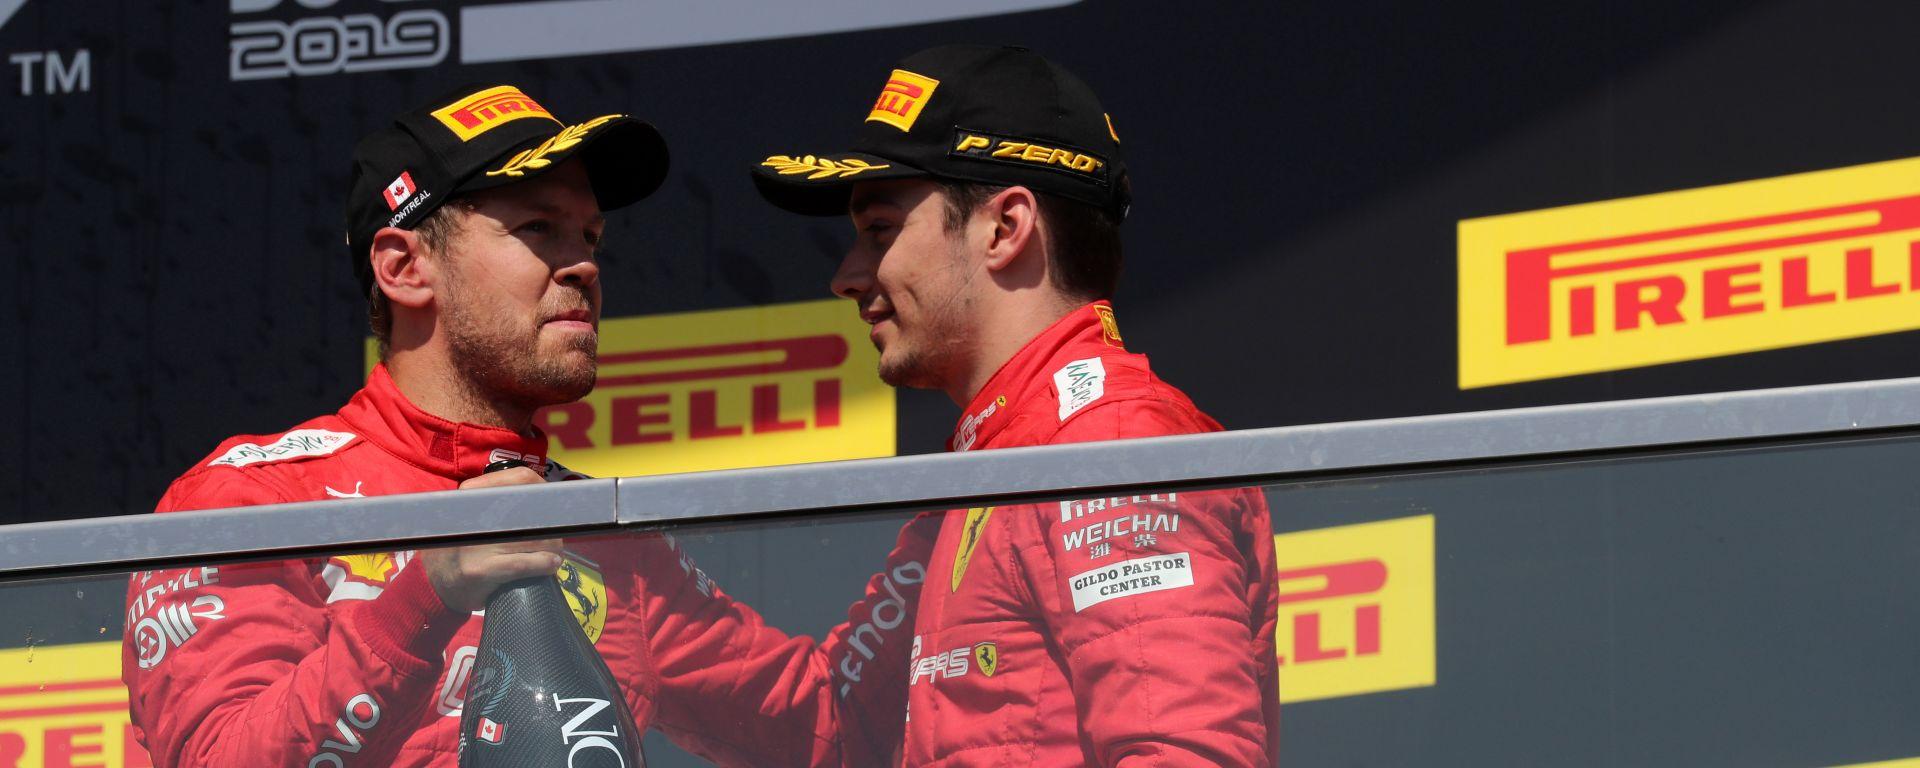 F1 GP Canada 2019, Sebastian Vettel e Charles Leclerc (Ferrari)